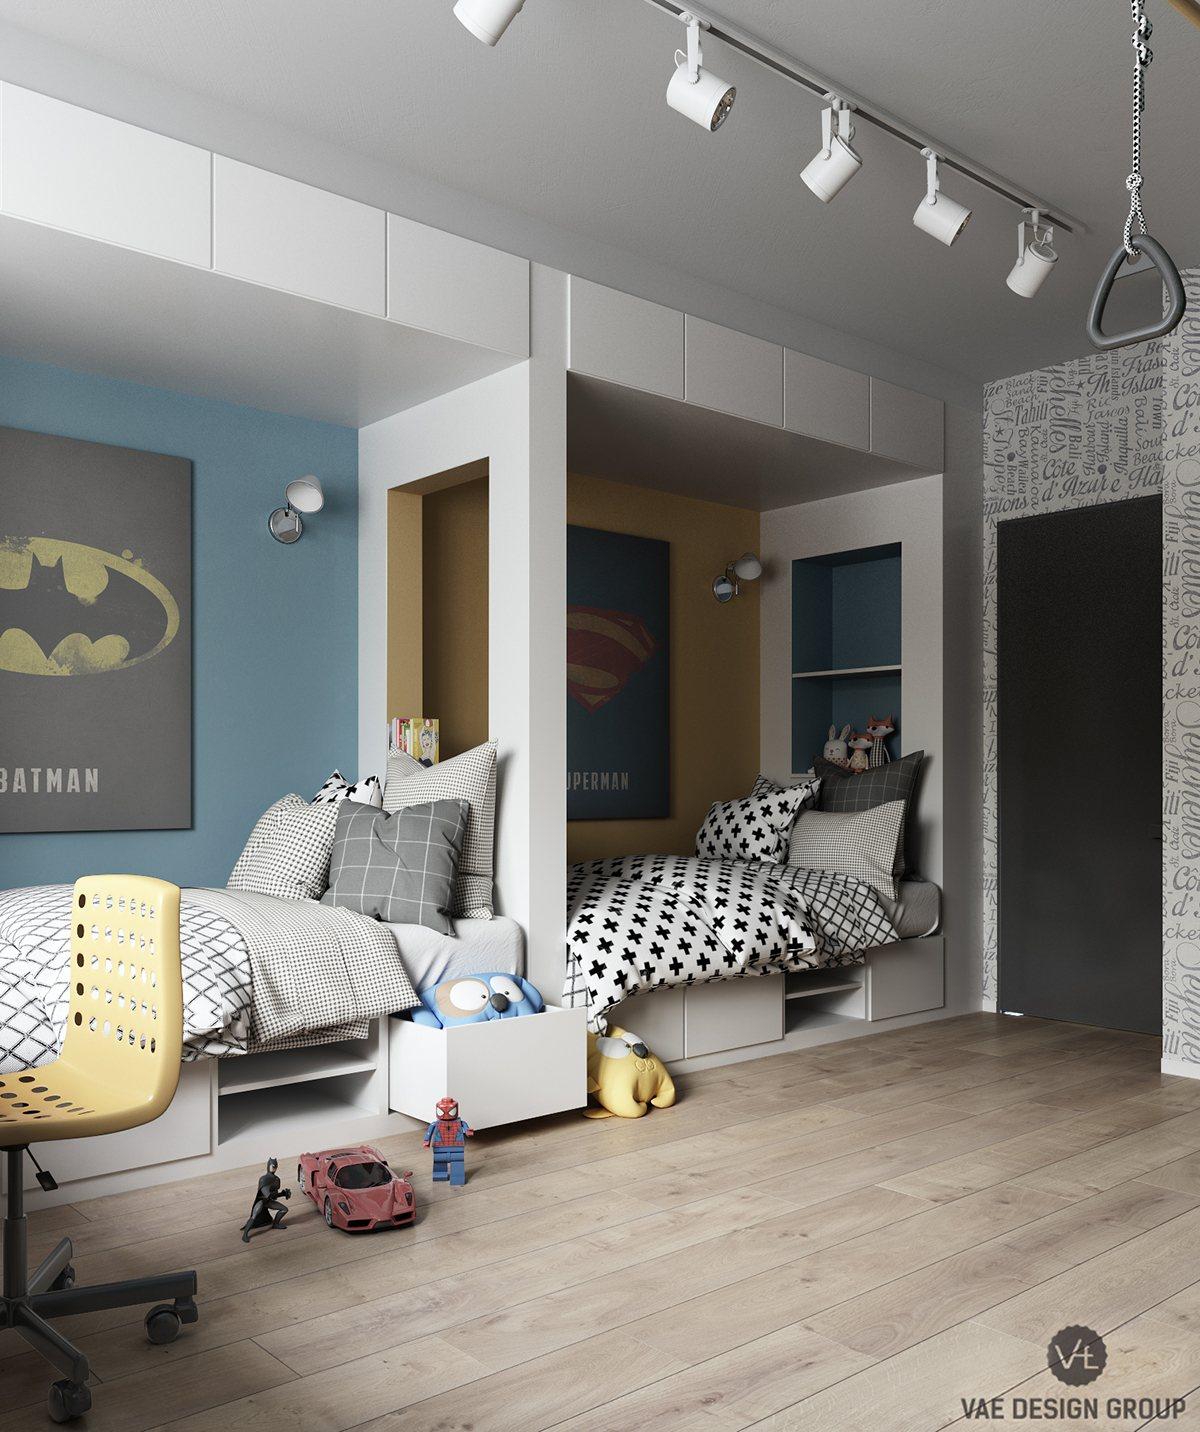 imaginative with superhero wallpaper